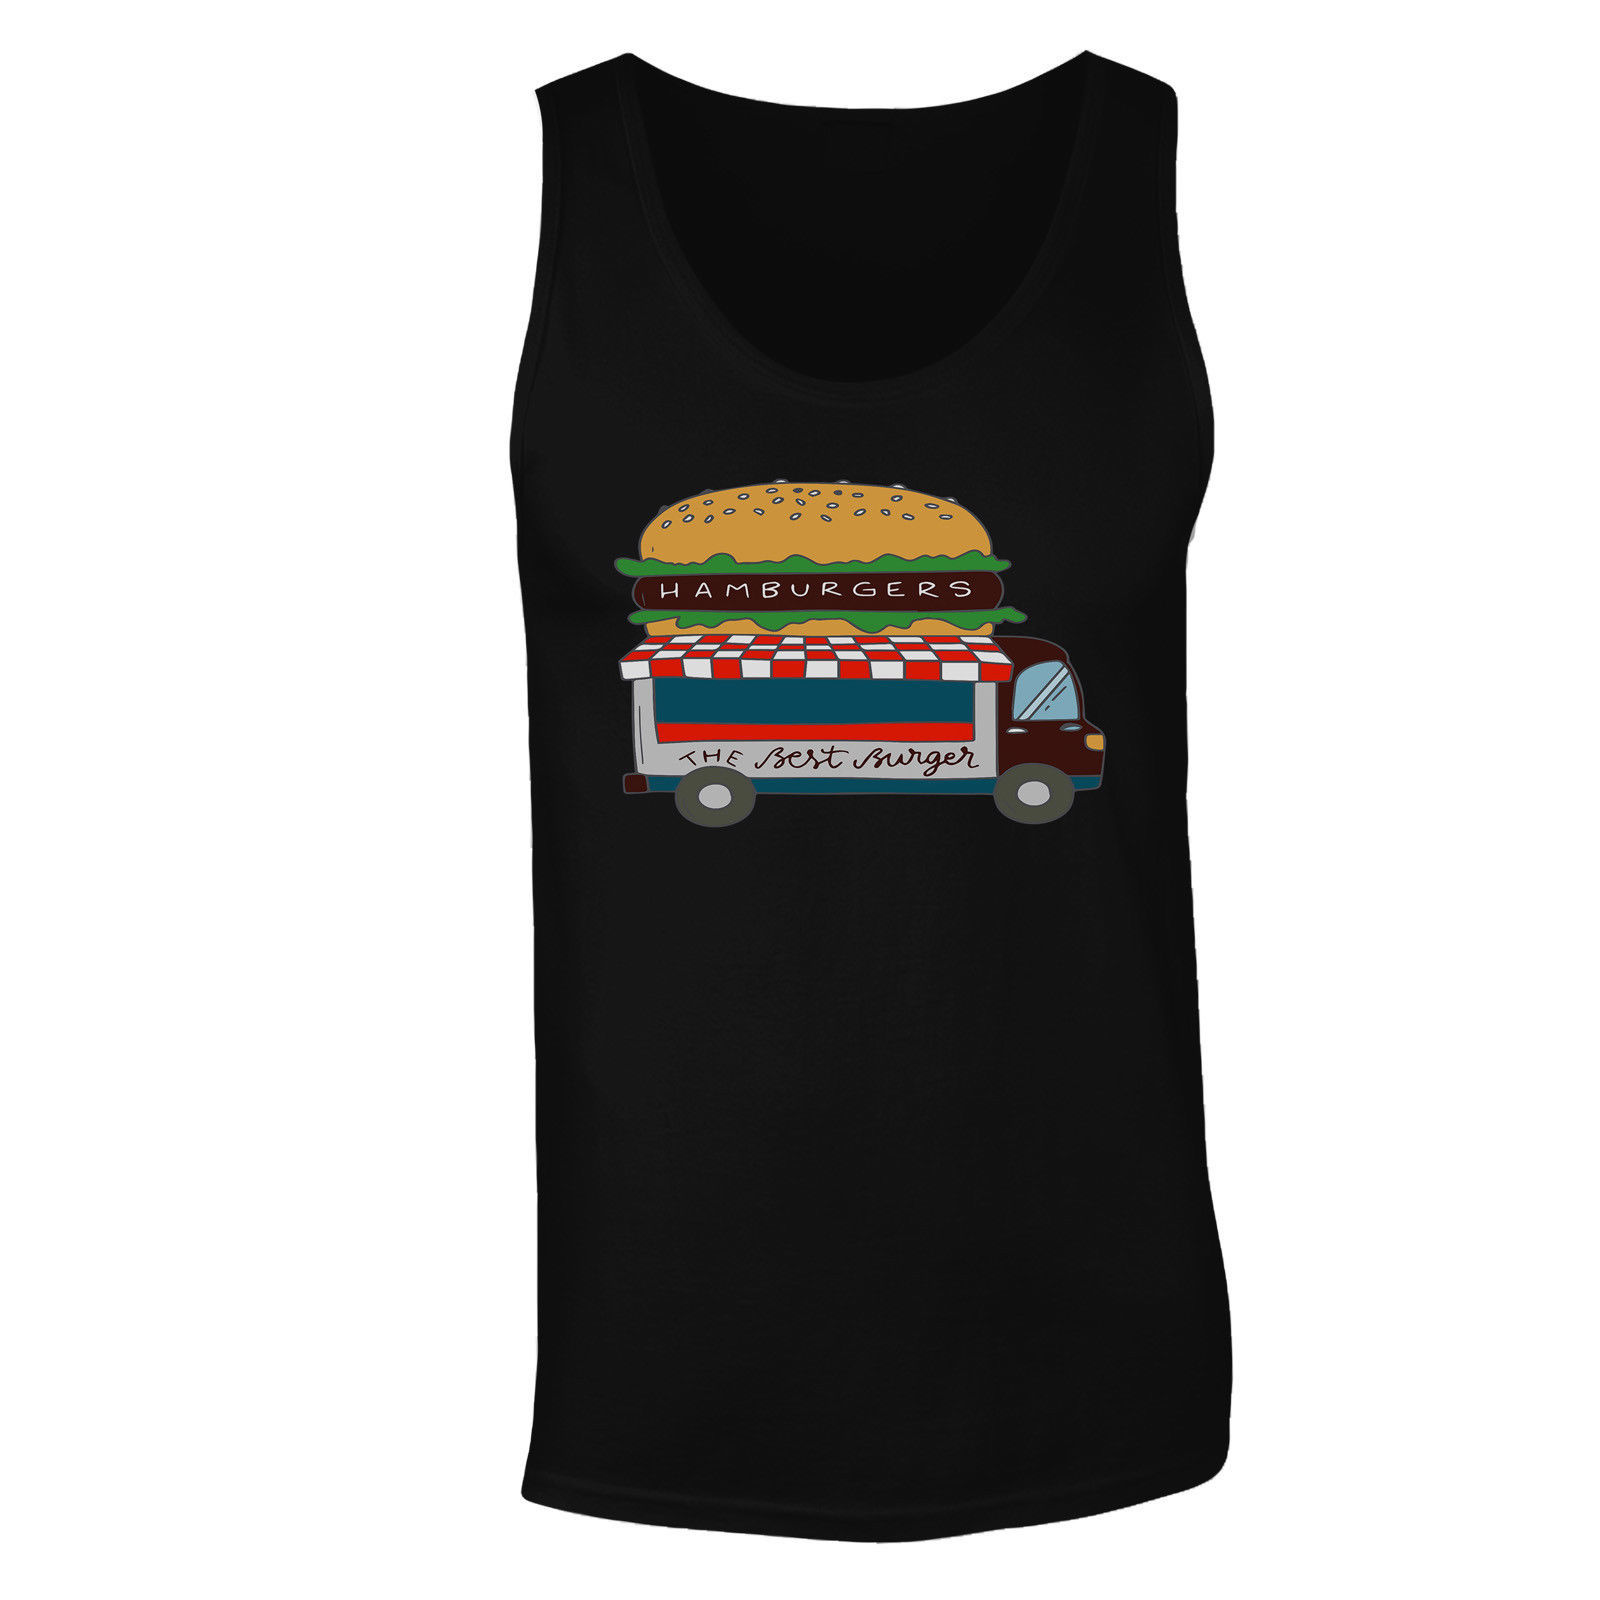 Hamburger Van Vintage Men's T-Shirt/Tank Top p403m